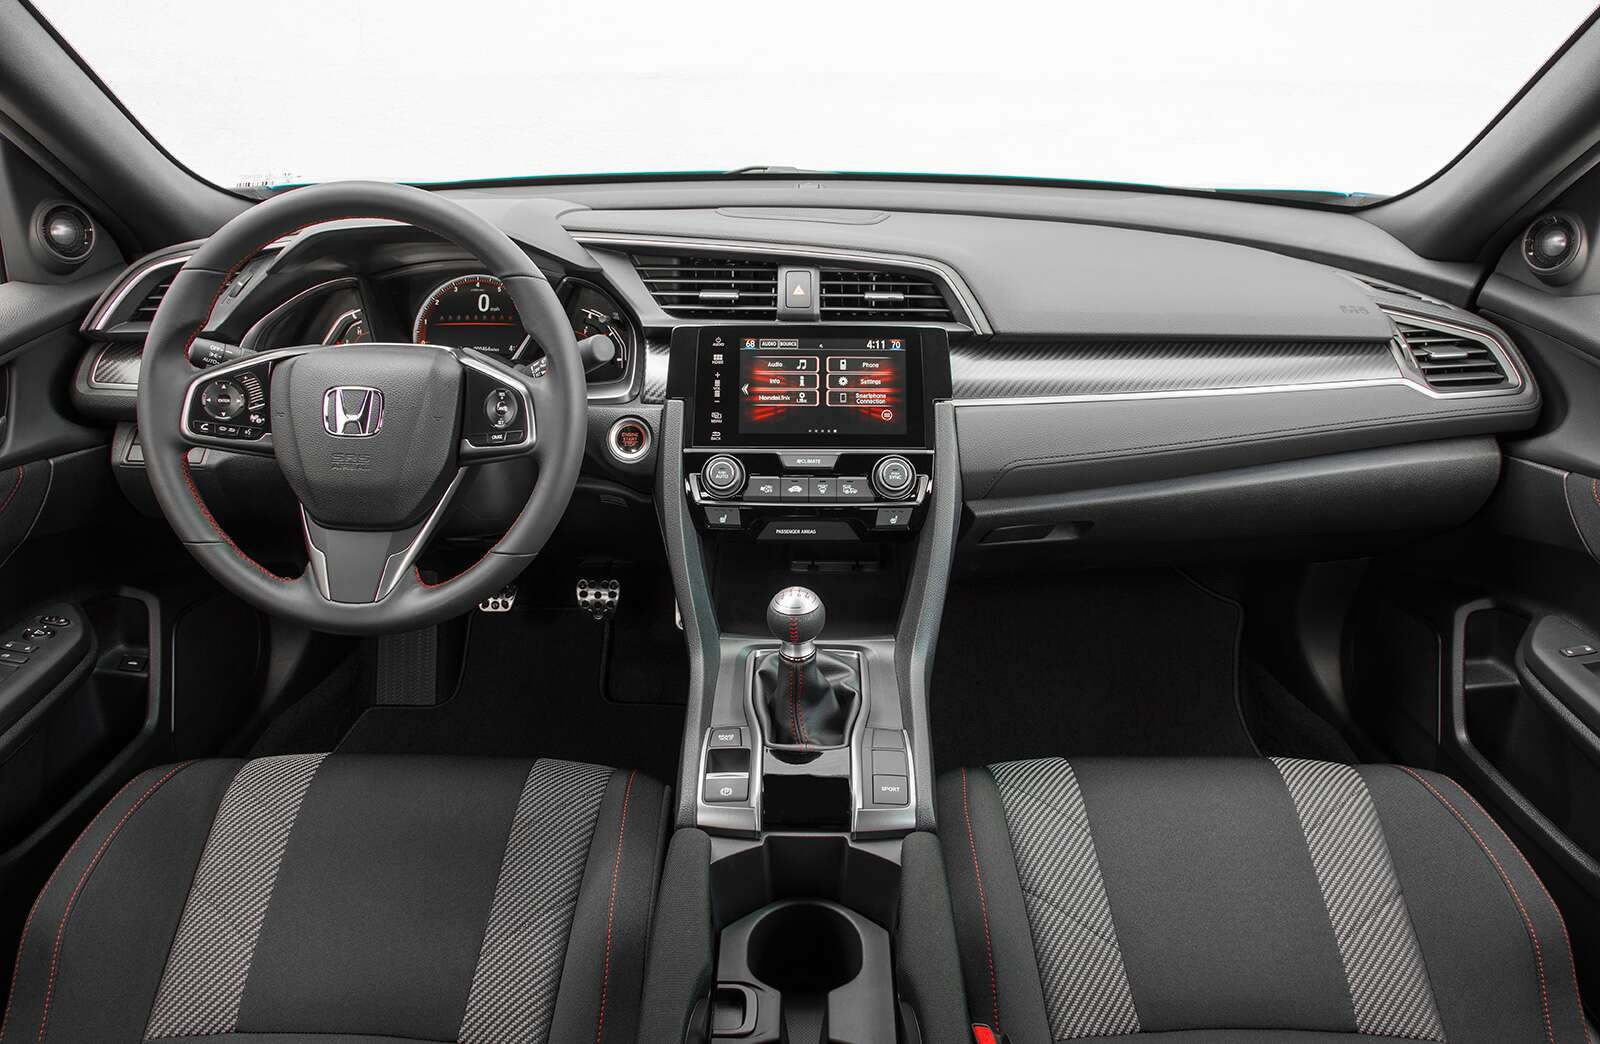 2017 honda civic manual transmission problems